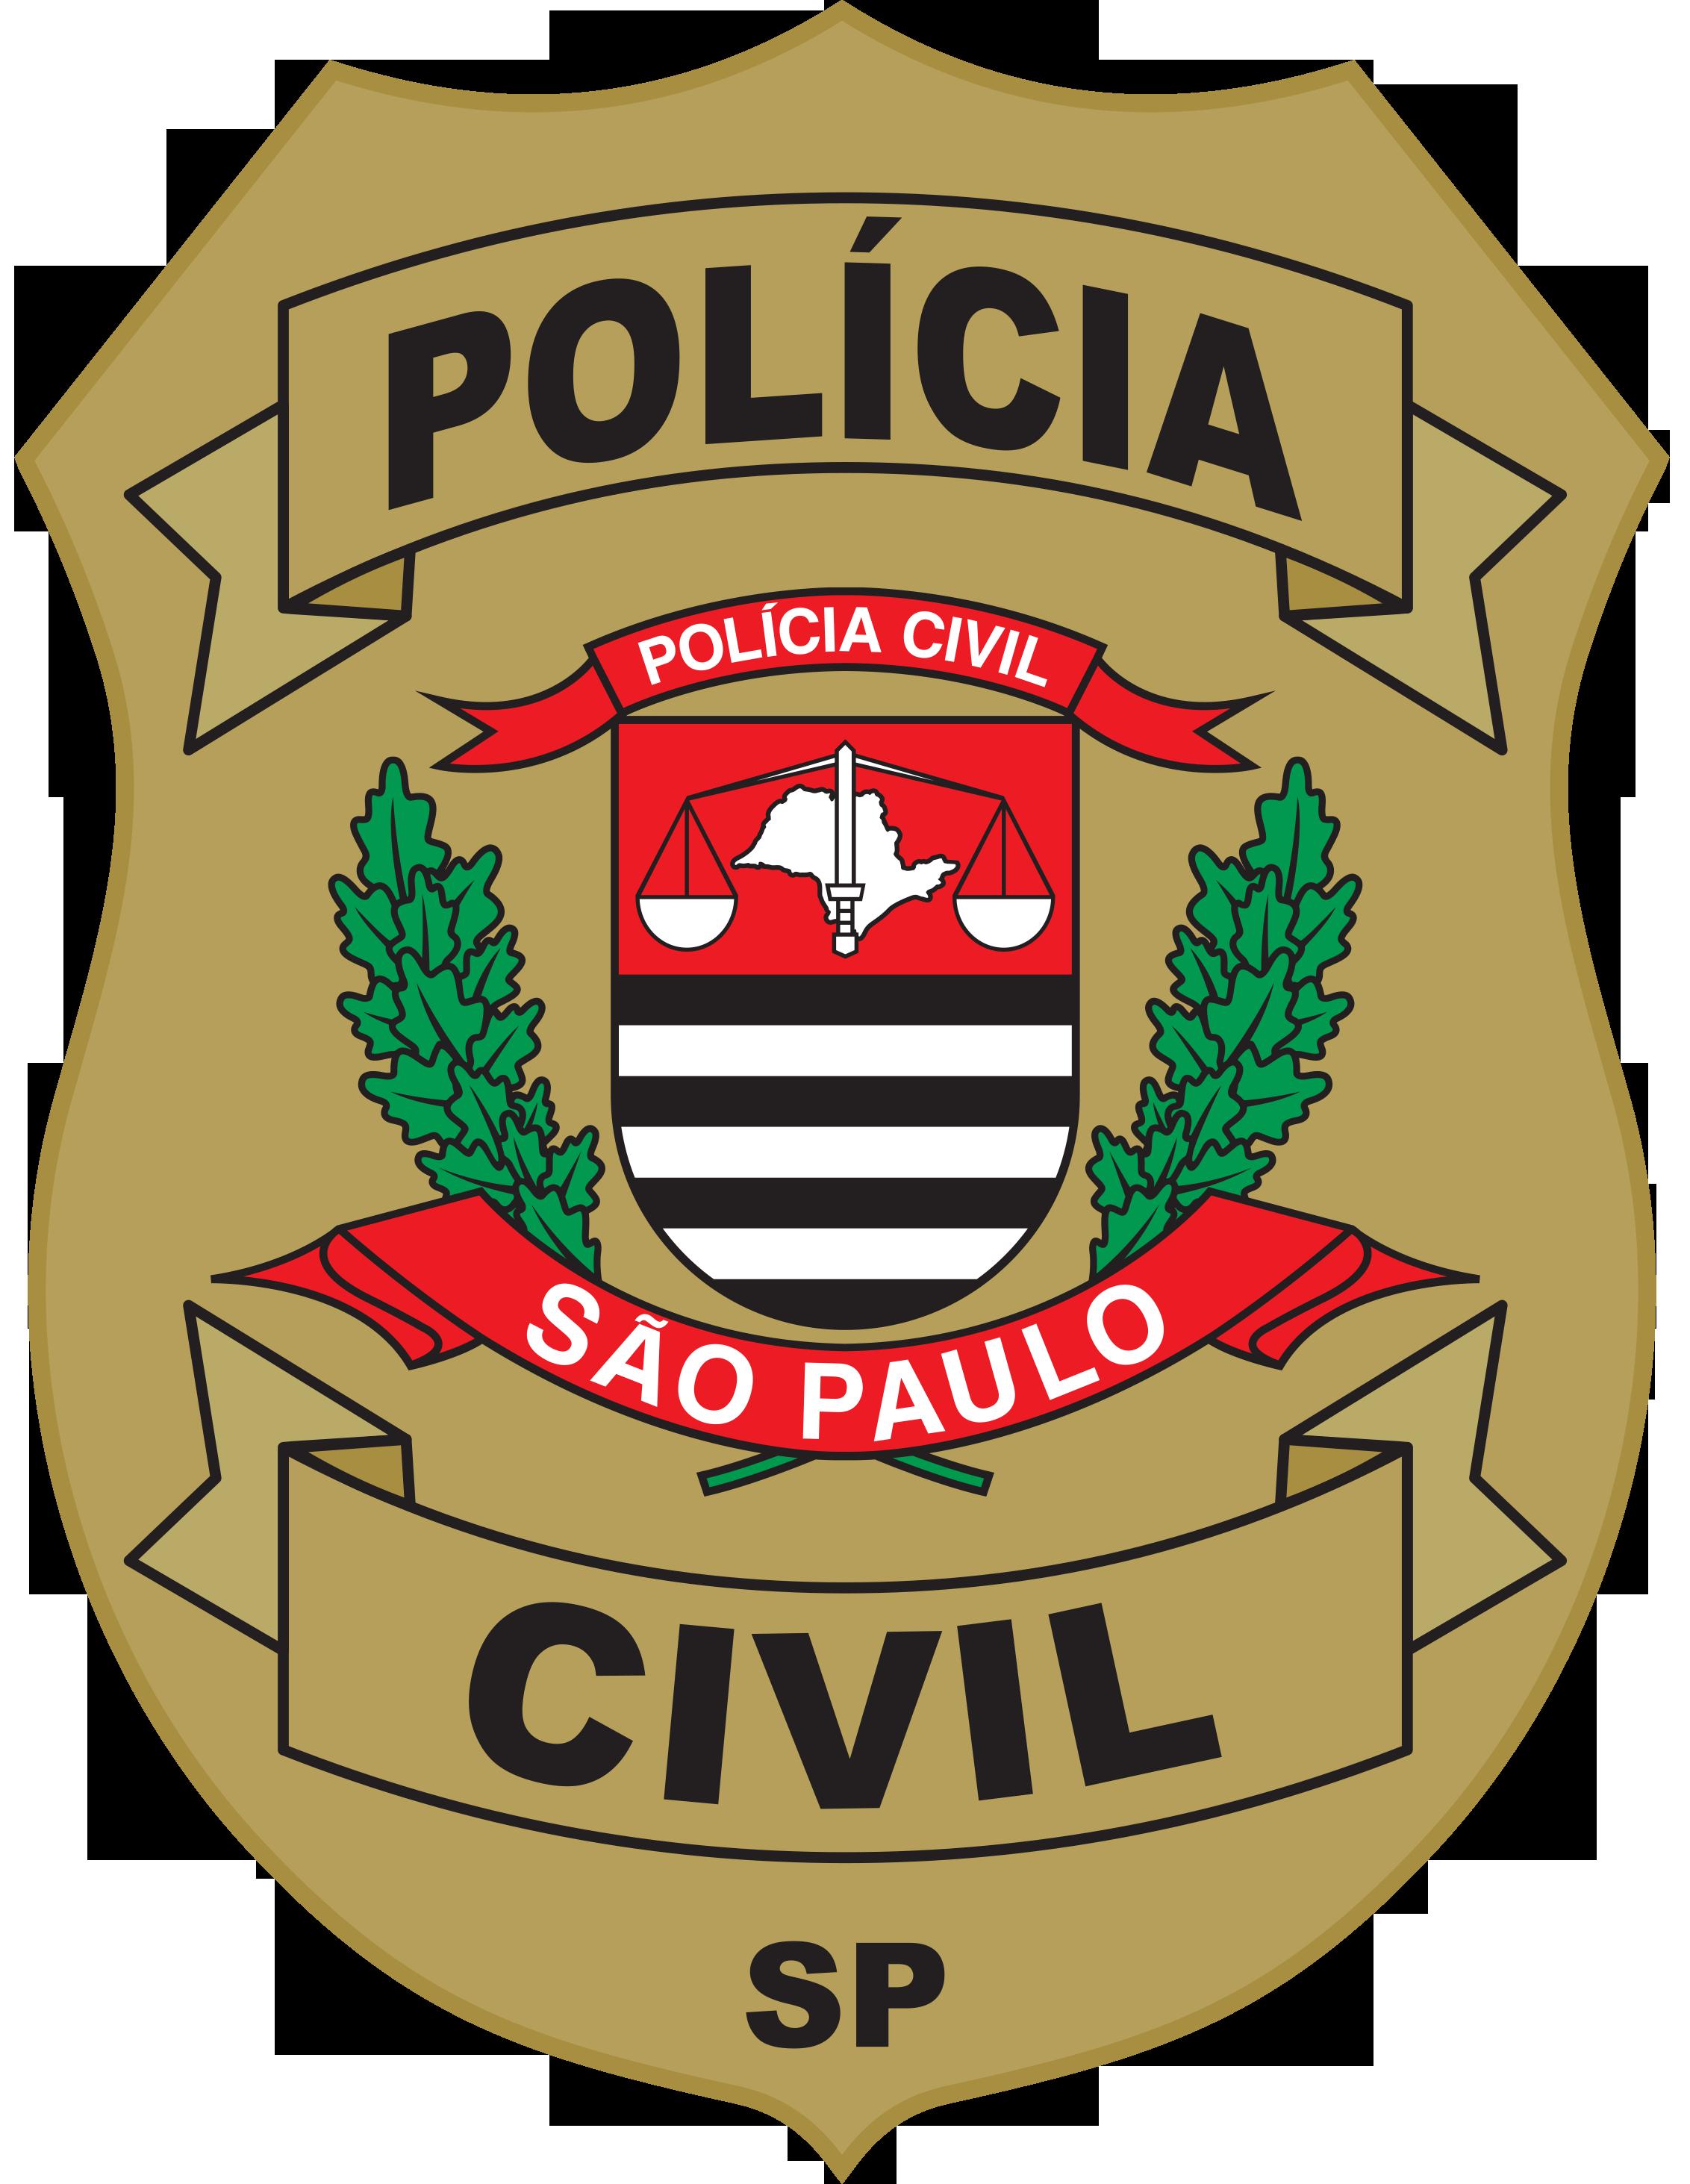 Brasão Nacional PCSP Moldura.png